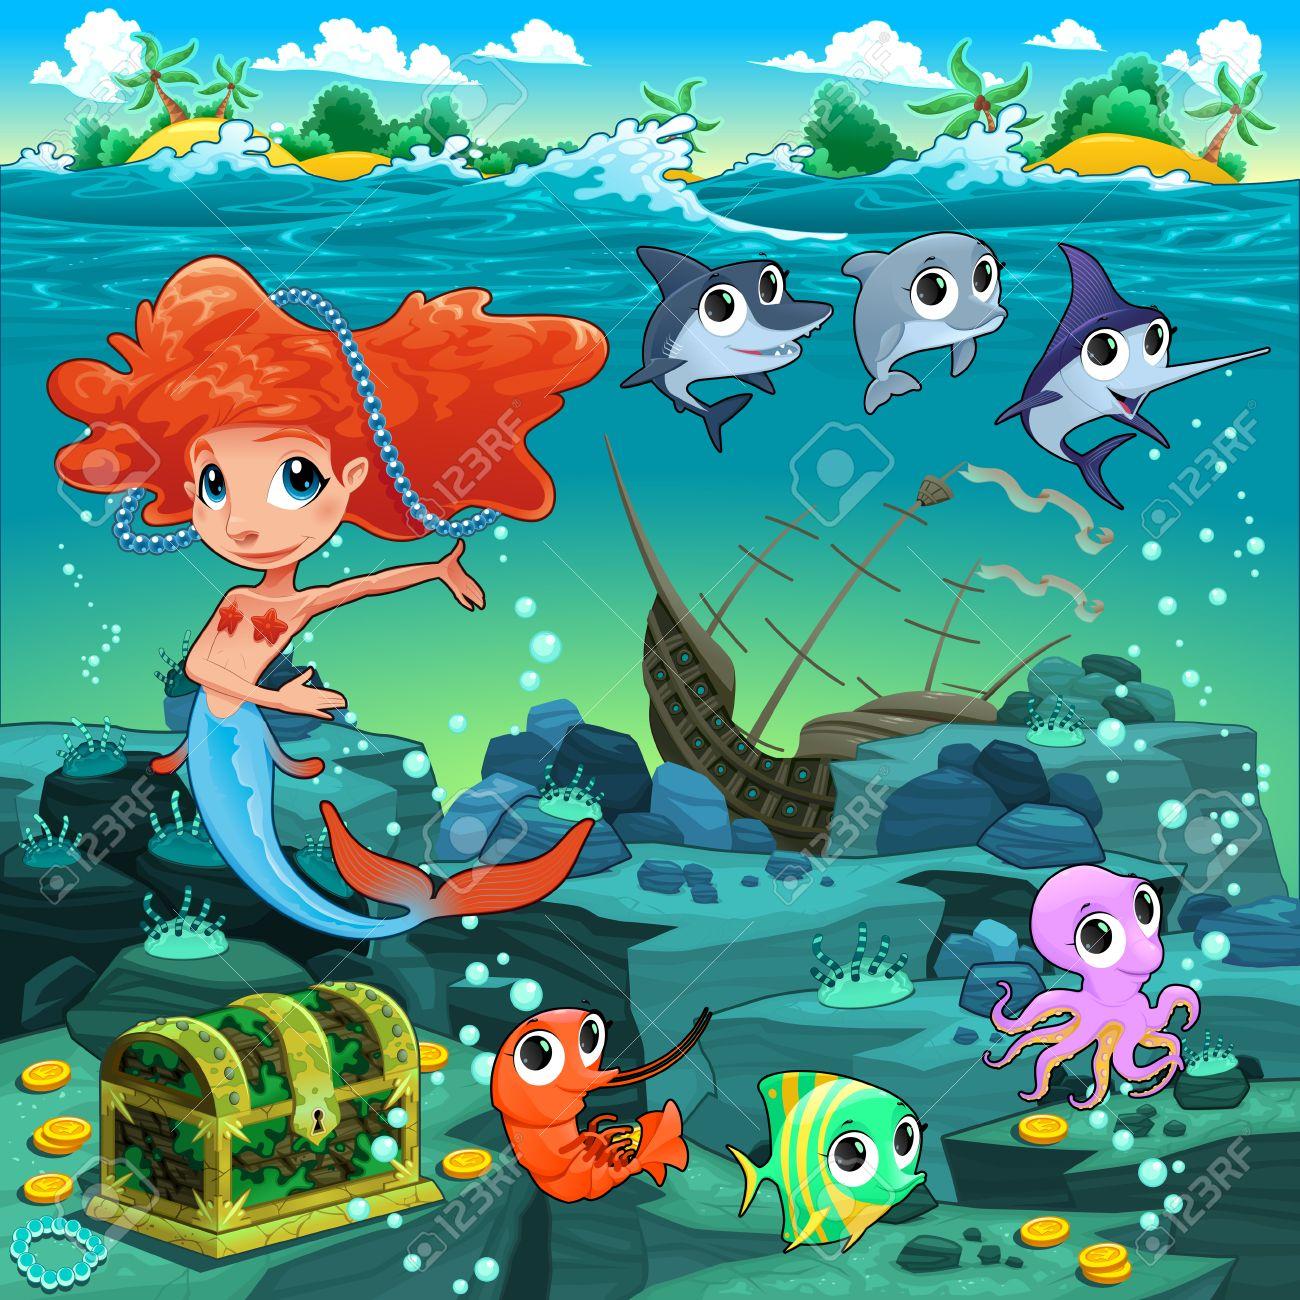 Mermaid with funny animals on the sea floor. Cartoon vector illustration. - 37369171